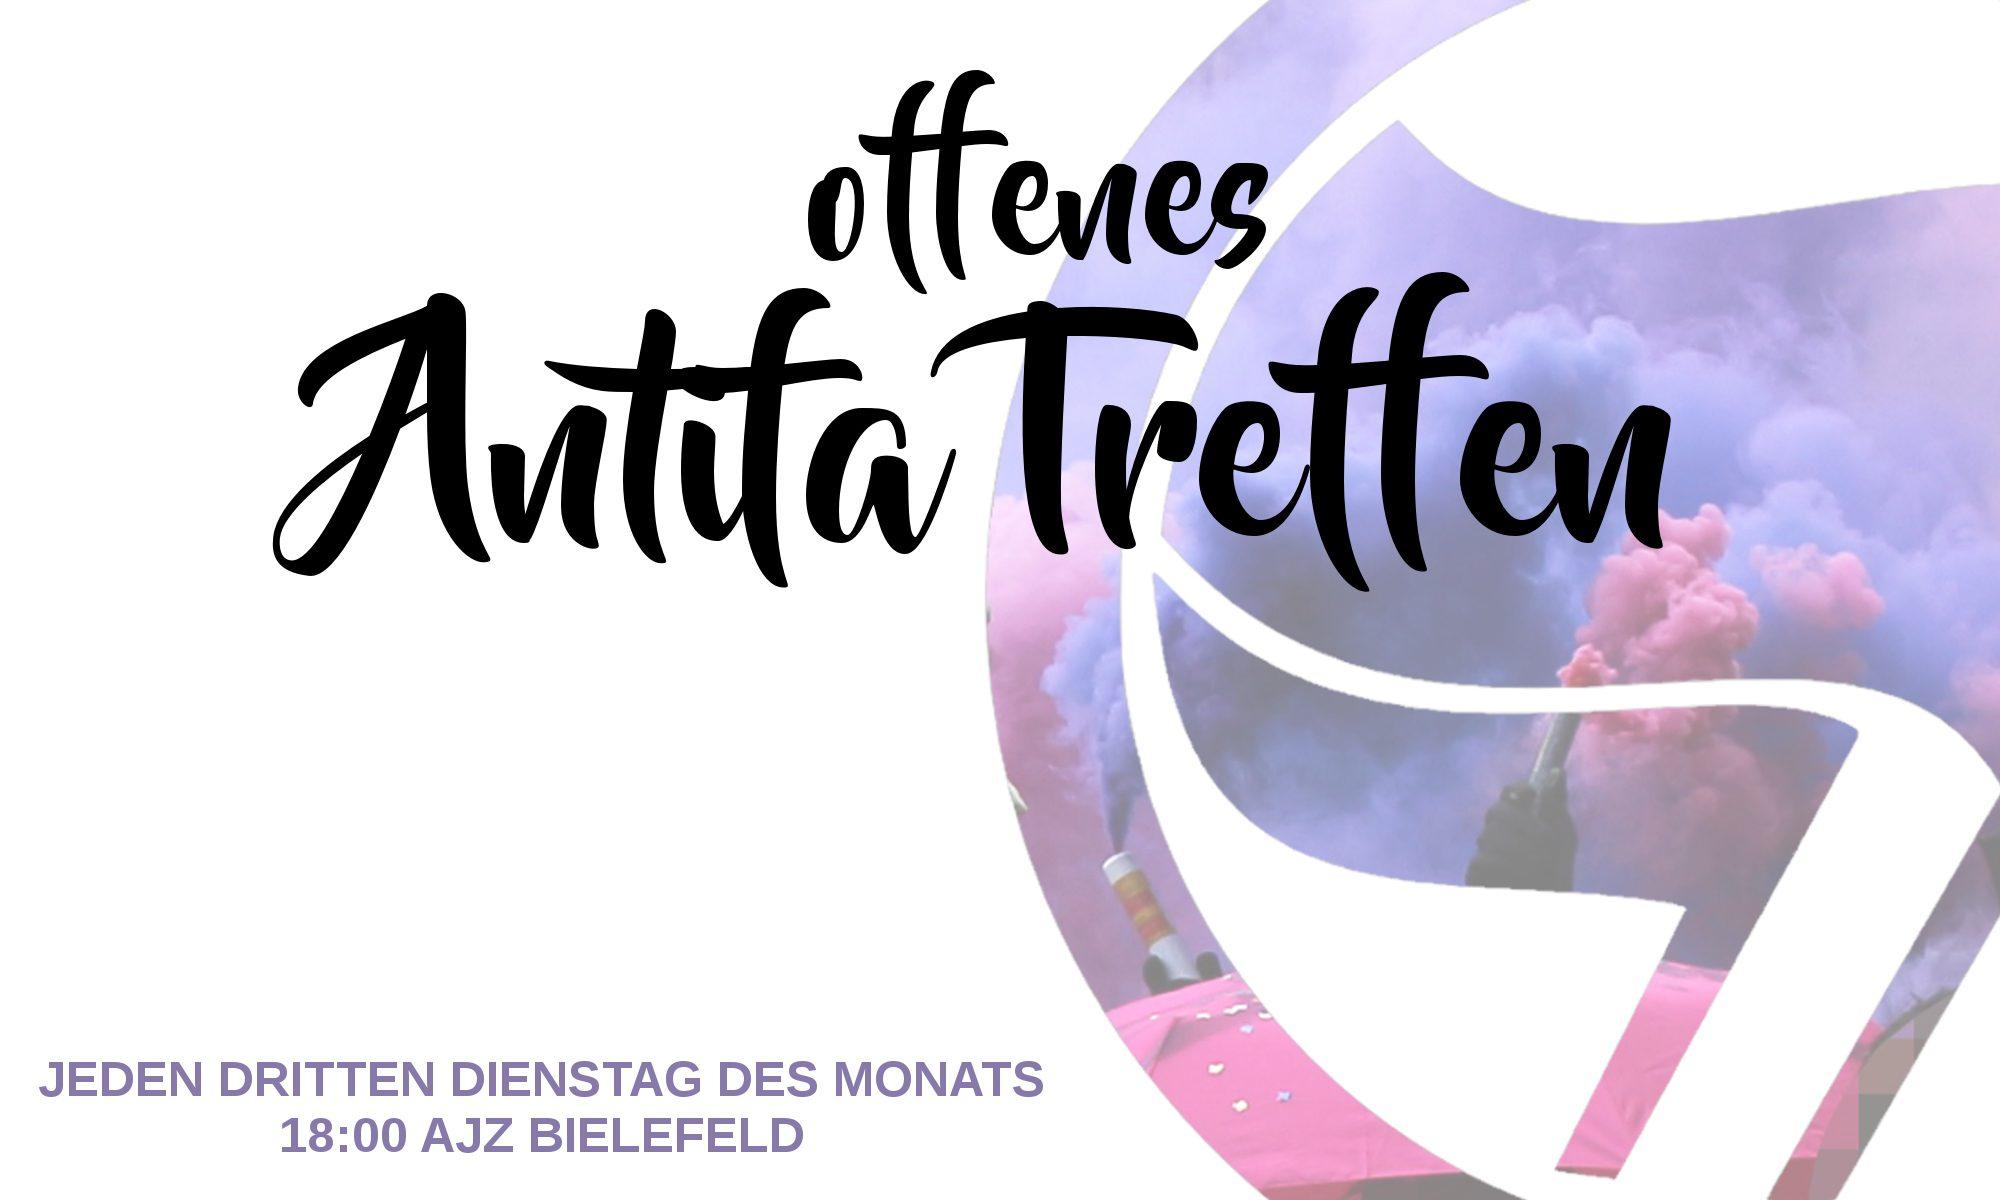 Offenes Antifa Treffen Bielefeld